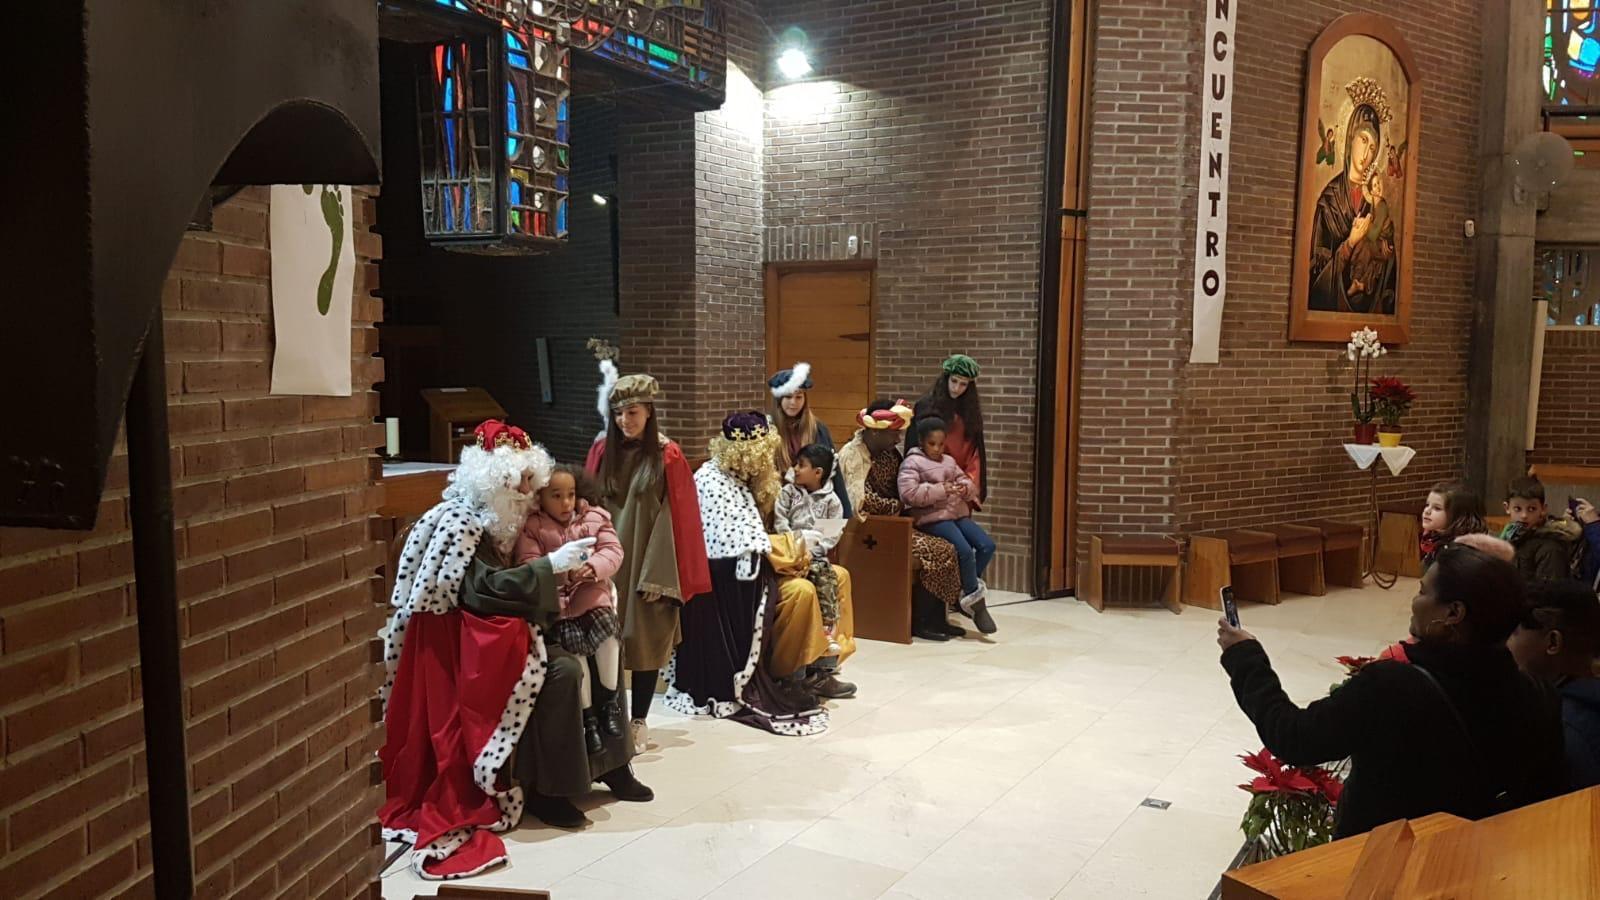 teatro-sange-mago-de-oz-2019-reyes-magos-8